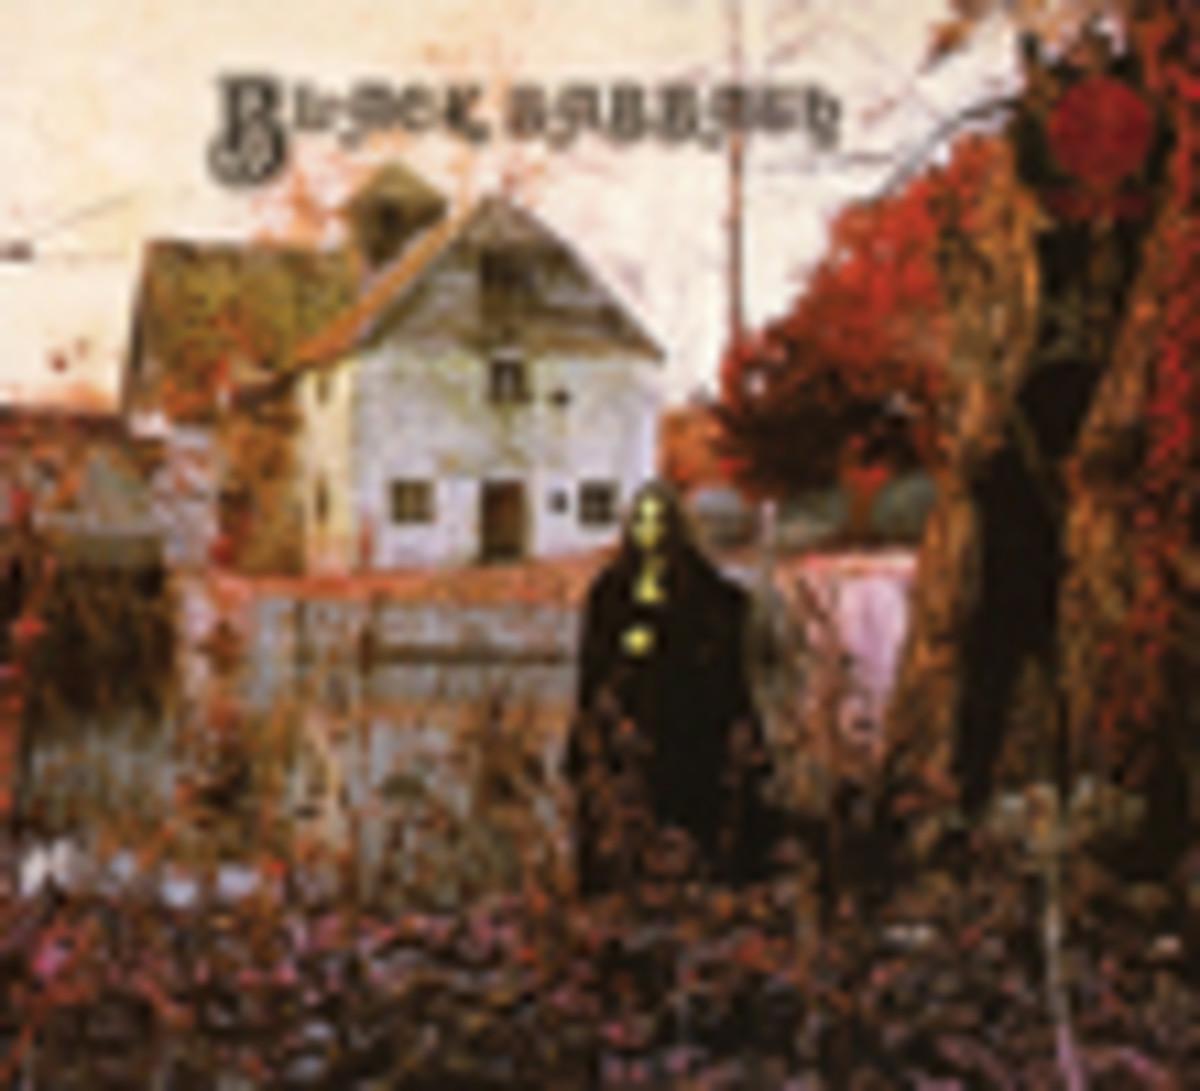 Black Sabbath Black Sabbath album